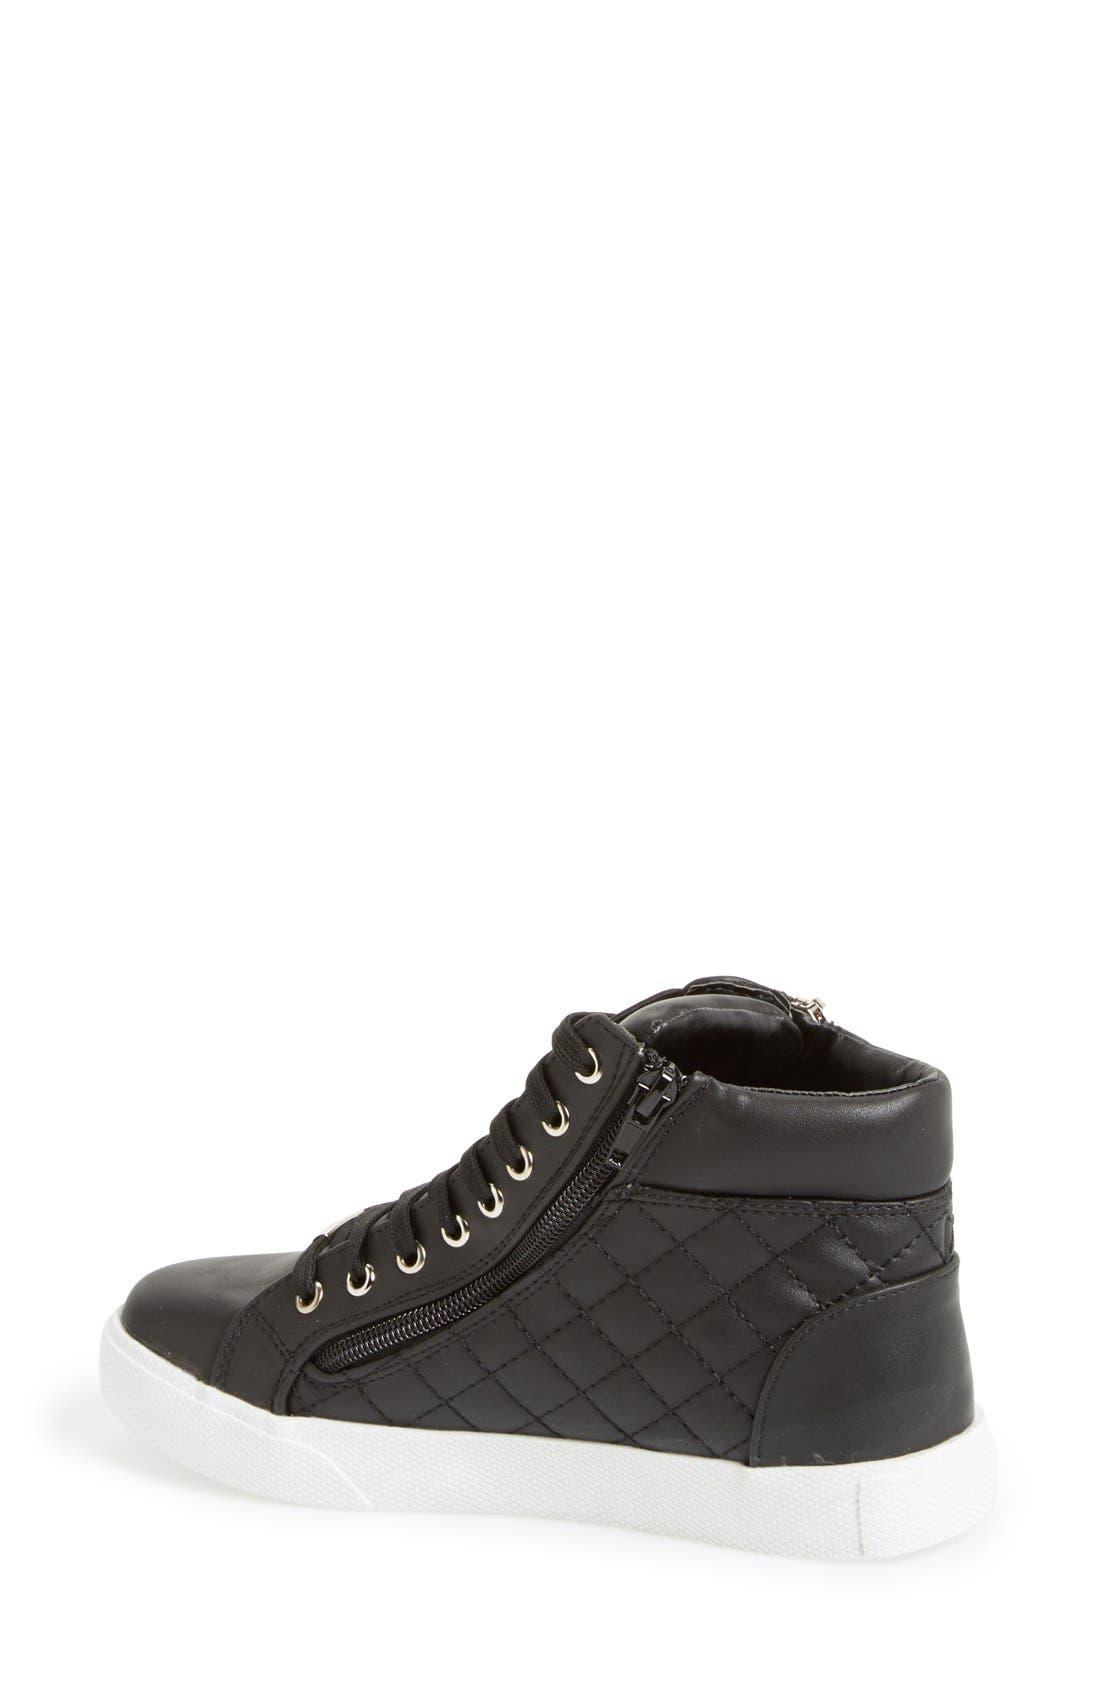 Alternate Image 2  - Steve Madden 'Decaf' Quilted High Top Sneaker (Women)